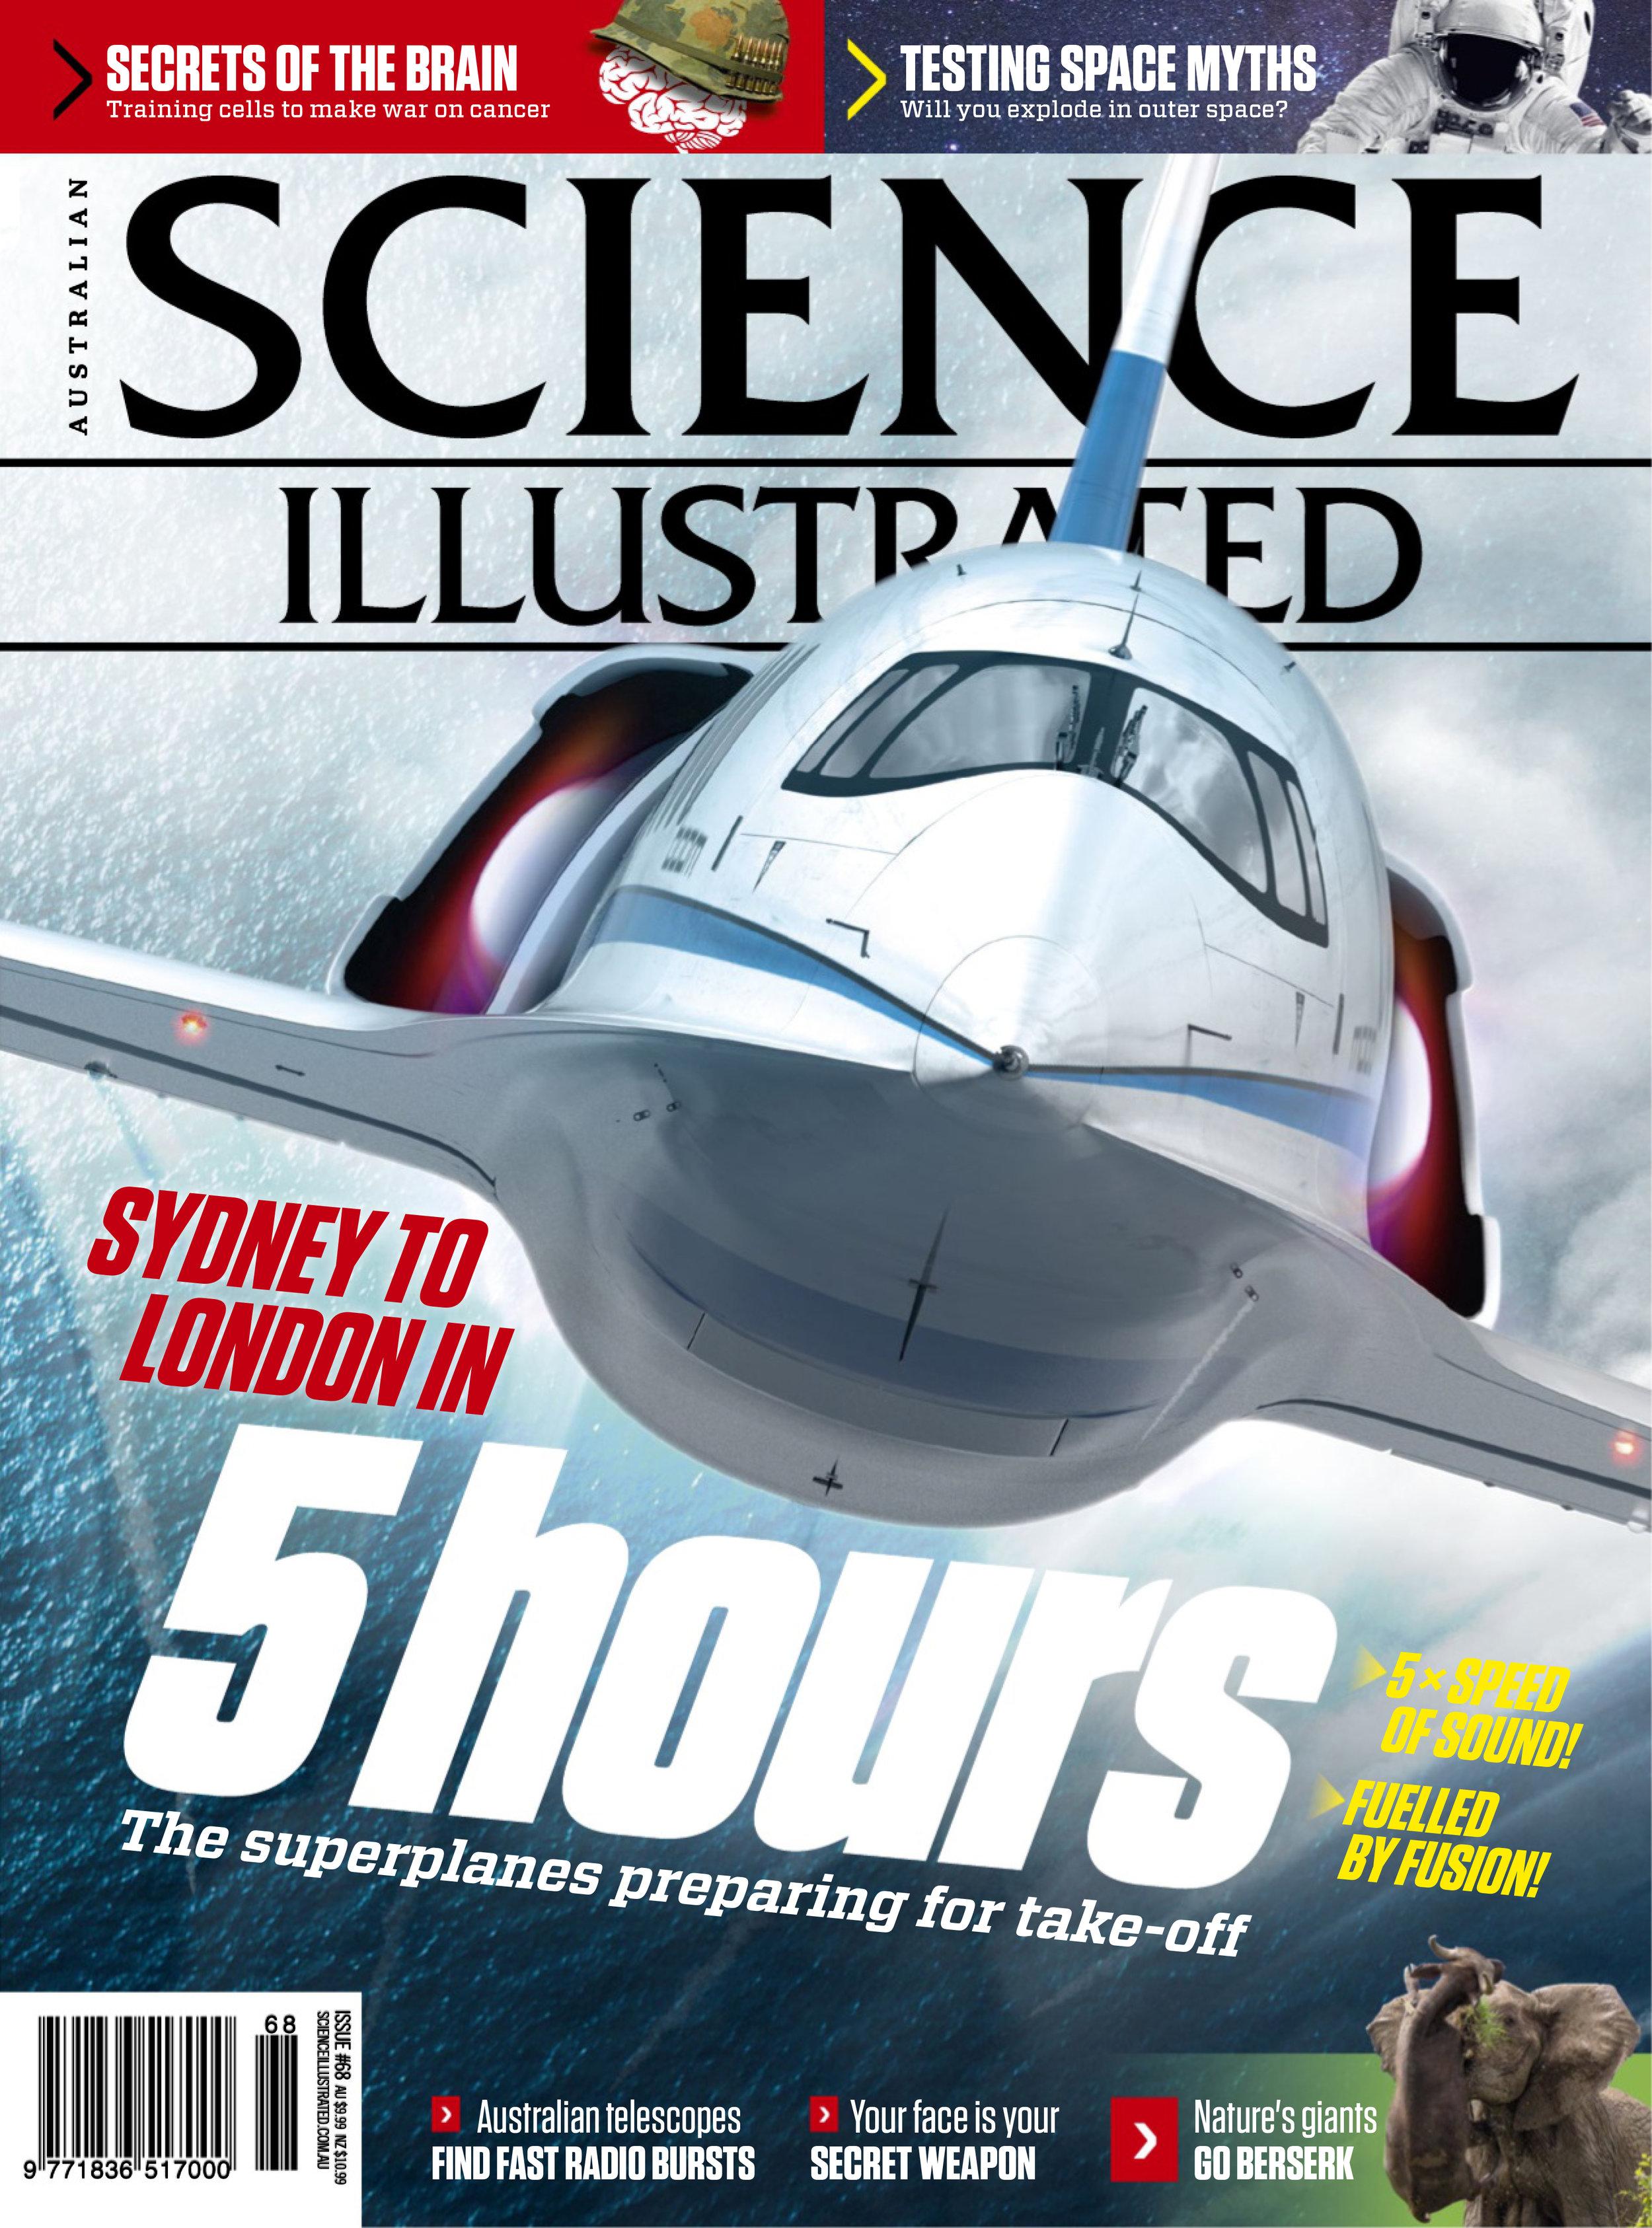 Science_Illustrated_Australia_-_June_22_2019-2.jpg